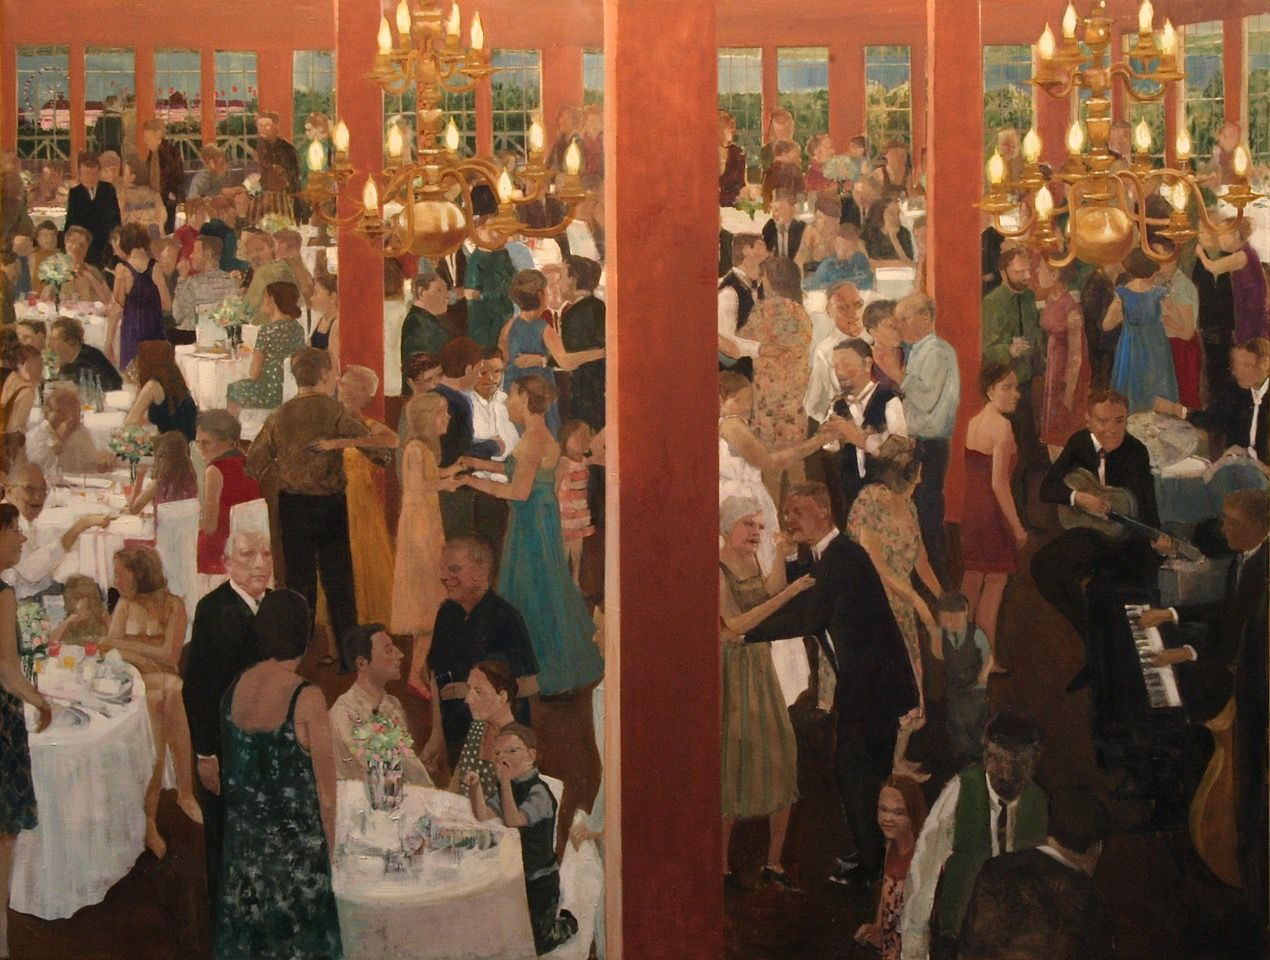 James Stewart, Deaf Republic Series, Weddings Before The War